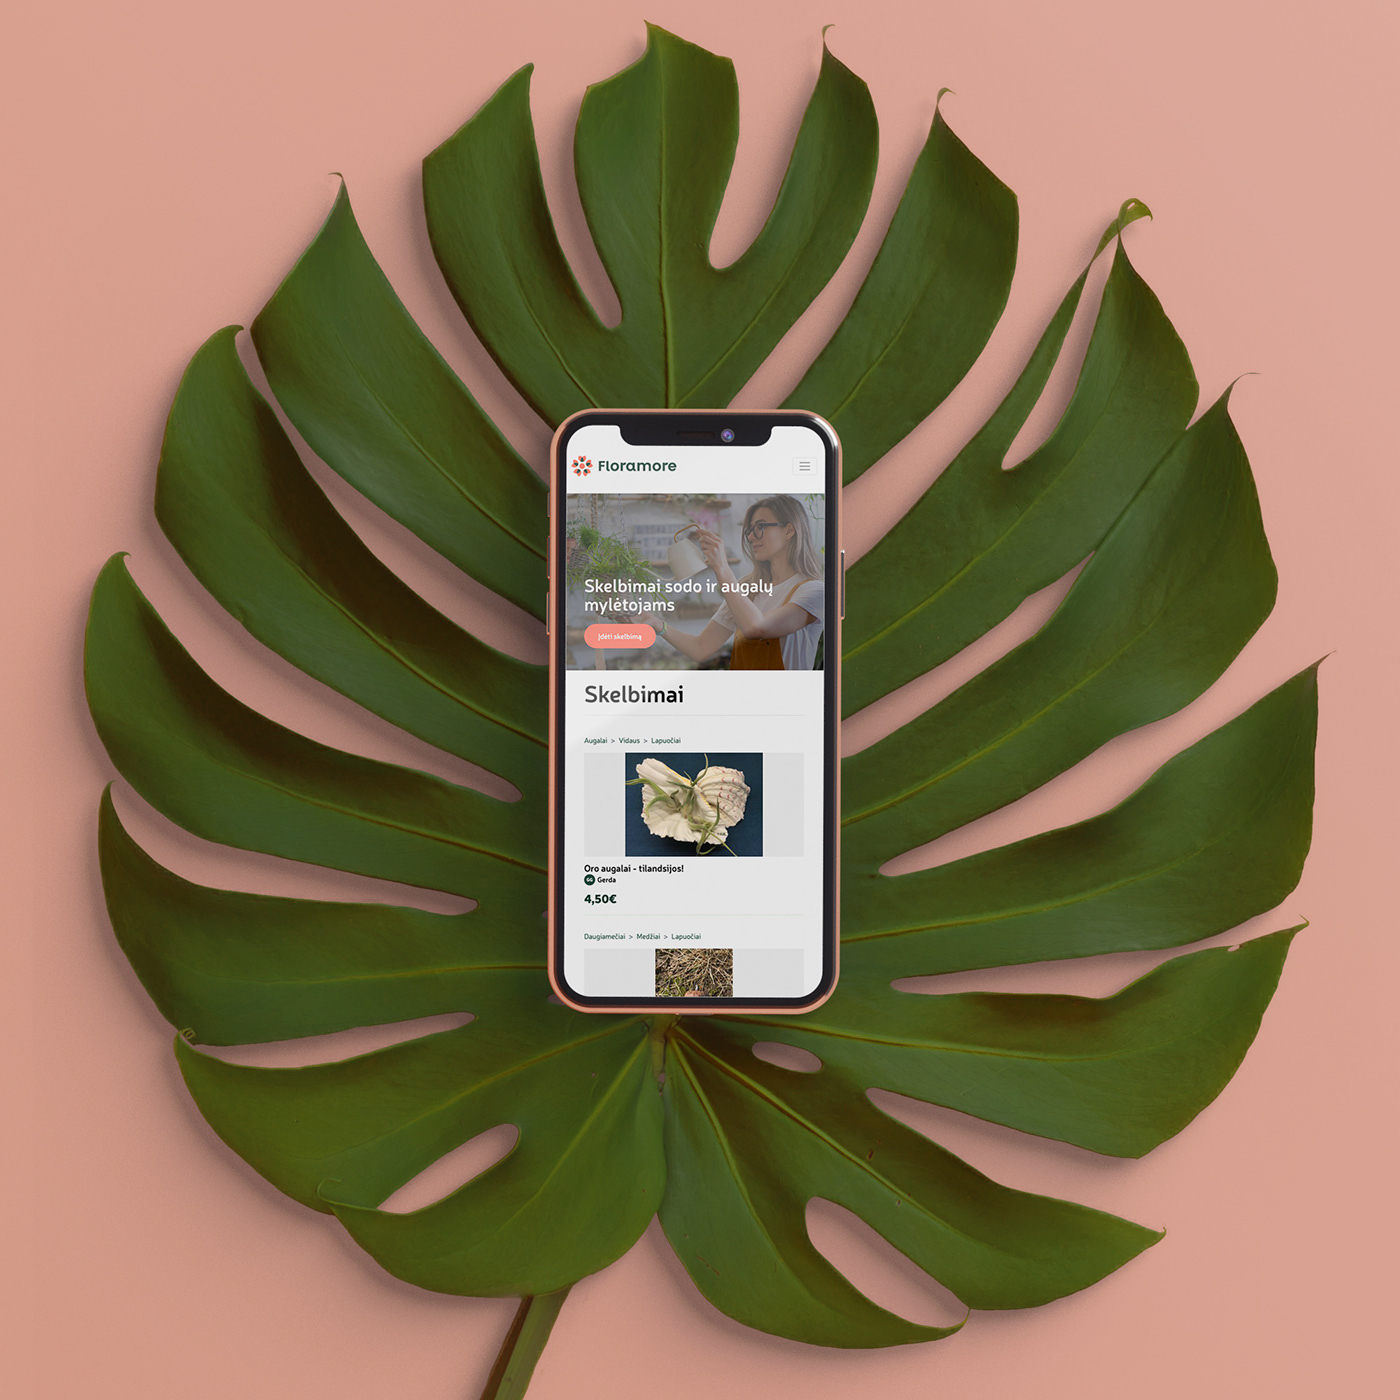 aliuslt,design,floramore,Flowers,plants,Web,mobile,Nature,Responsive